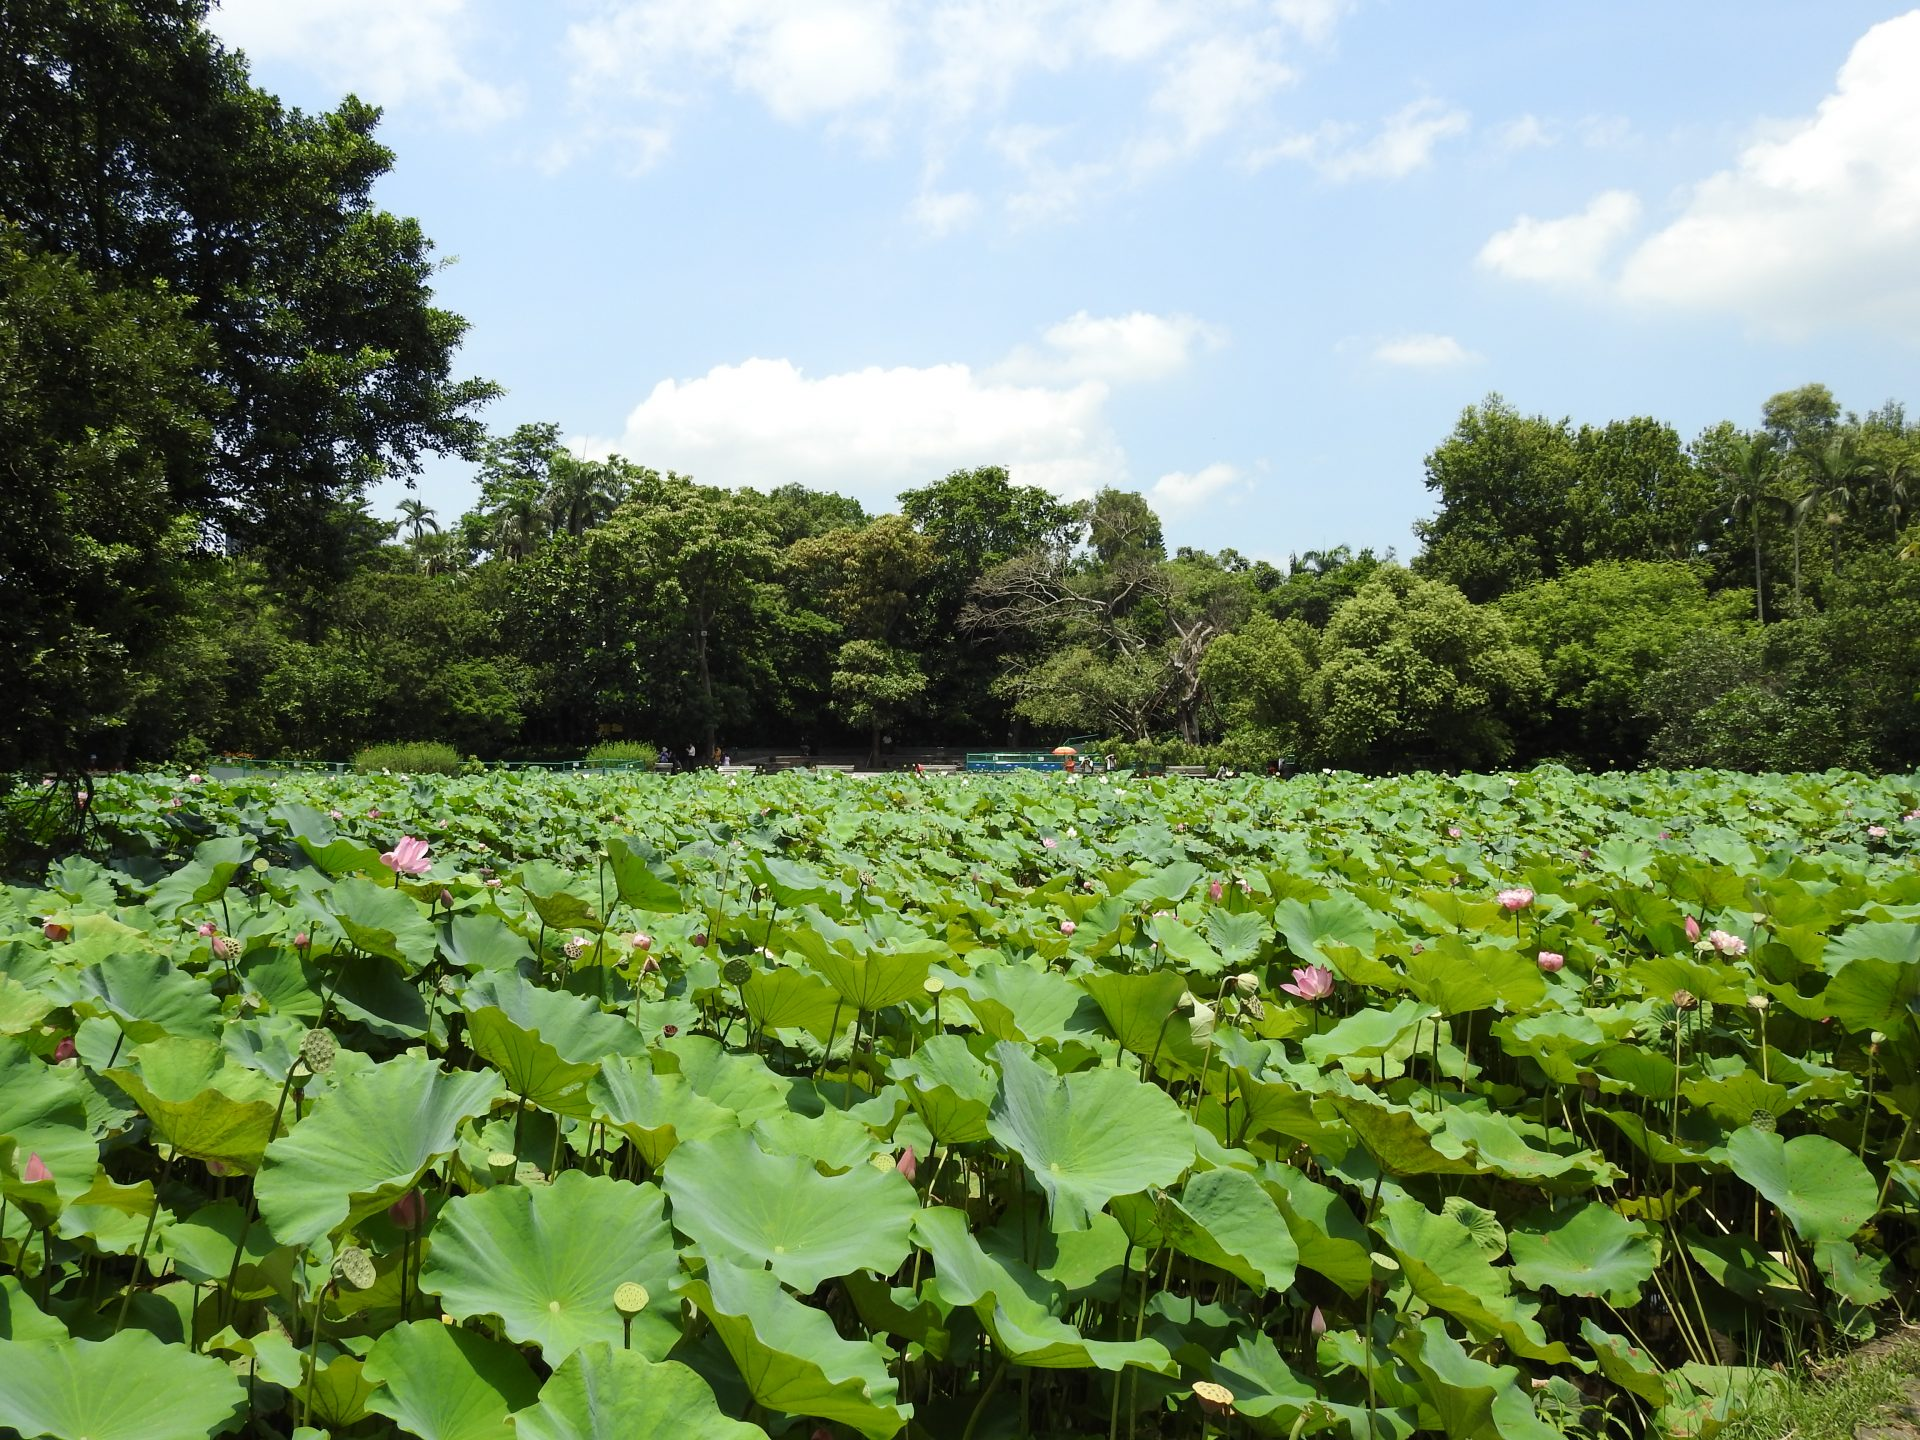 The lotus pond adjacent to the Nai Hai Educational Park in Taipei (Image: Billy Shyu/ Vision Times)